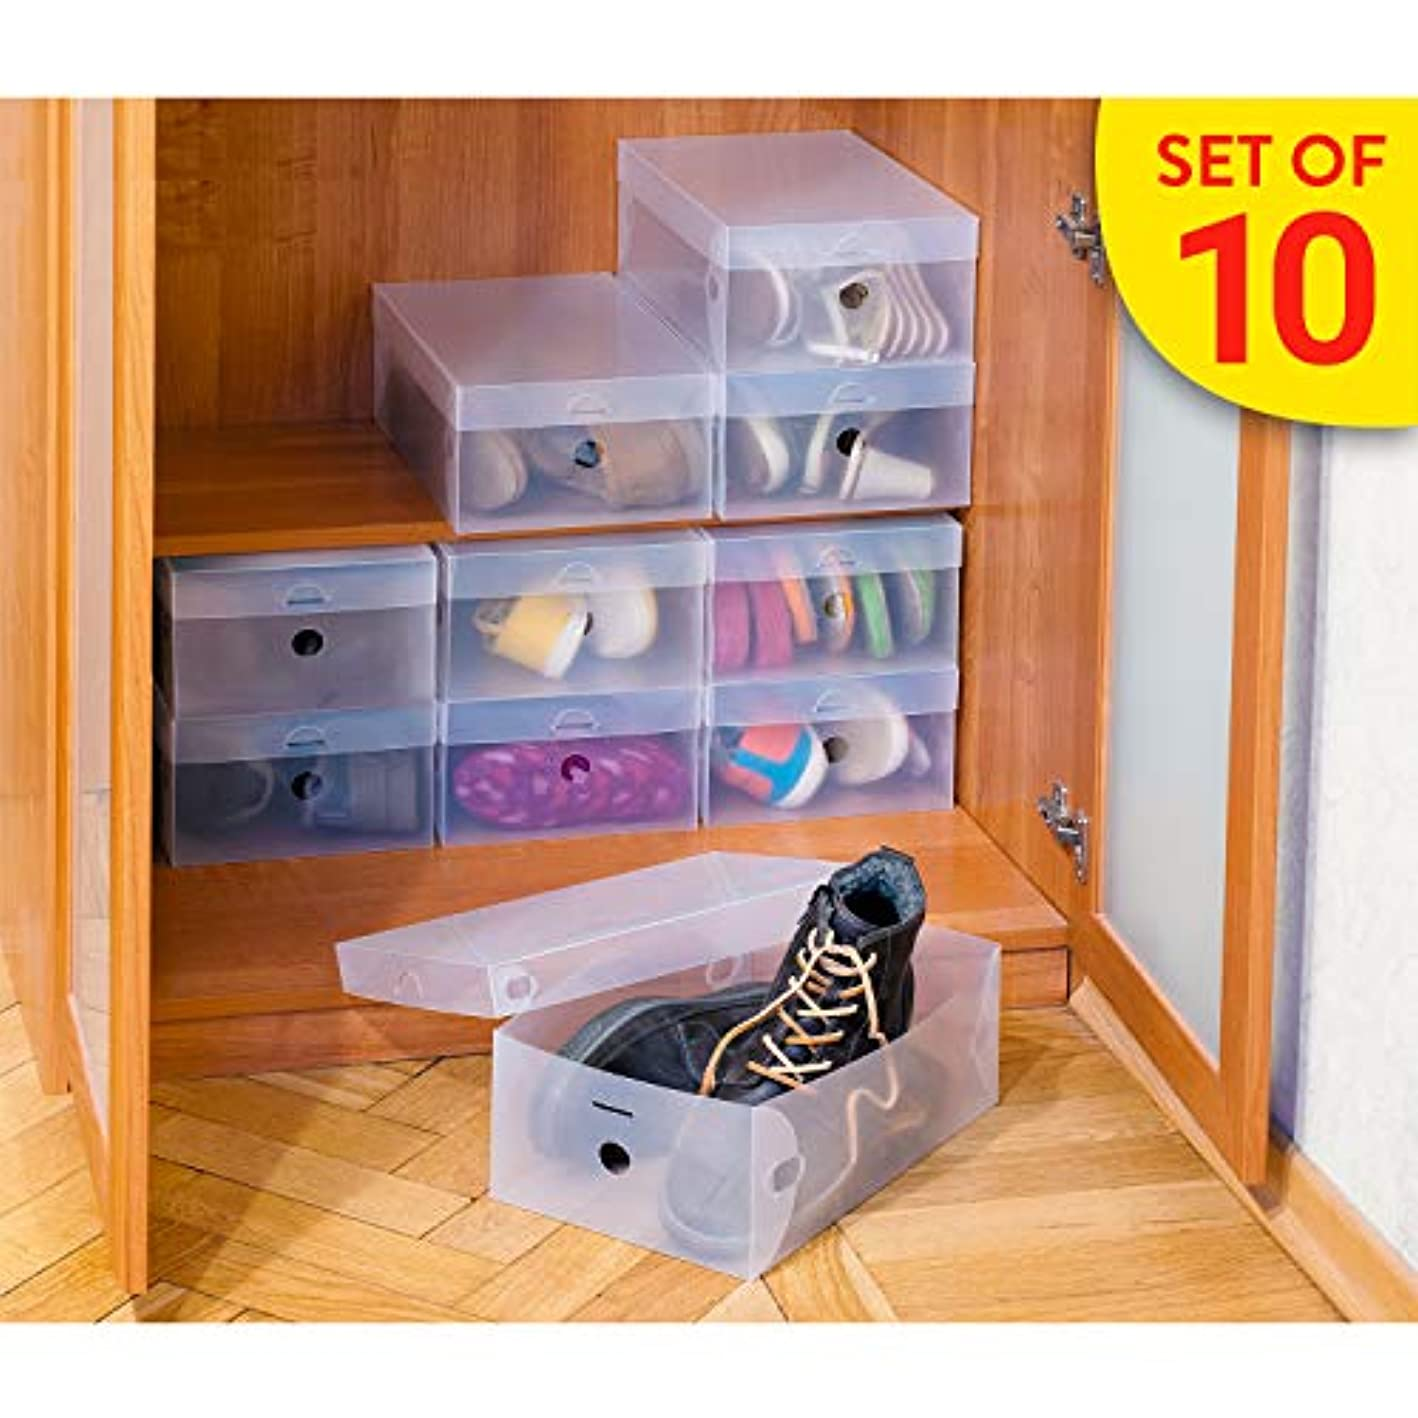 Tatkraft Glasgow Set of 10 Shoe Boxes Semi-transparent Ribbed Strong Plastic